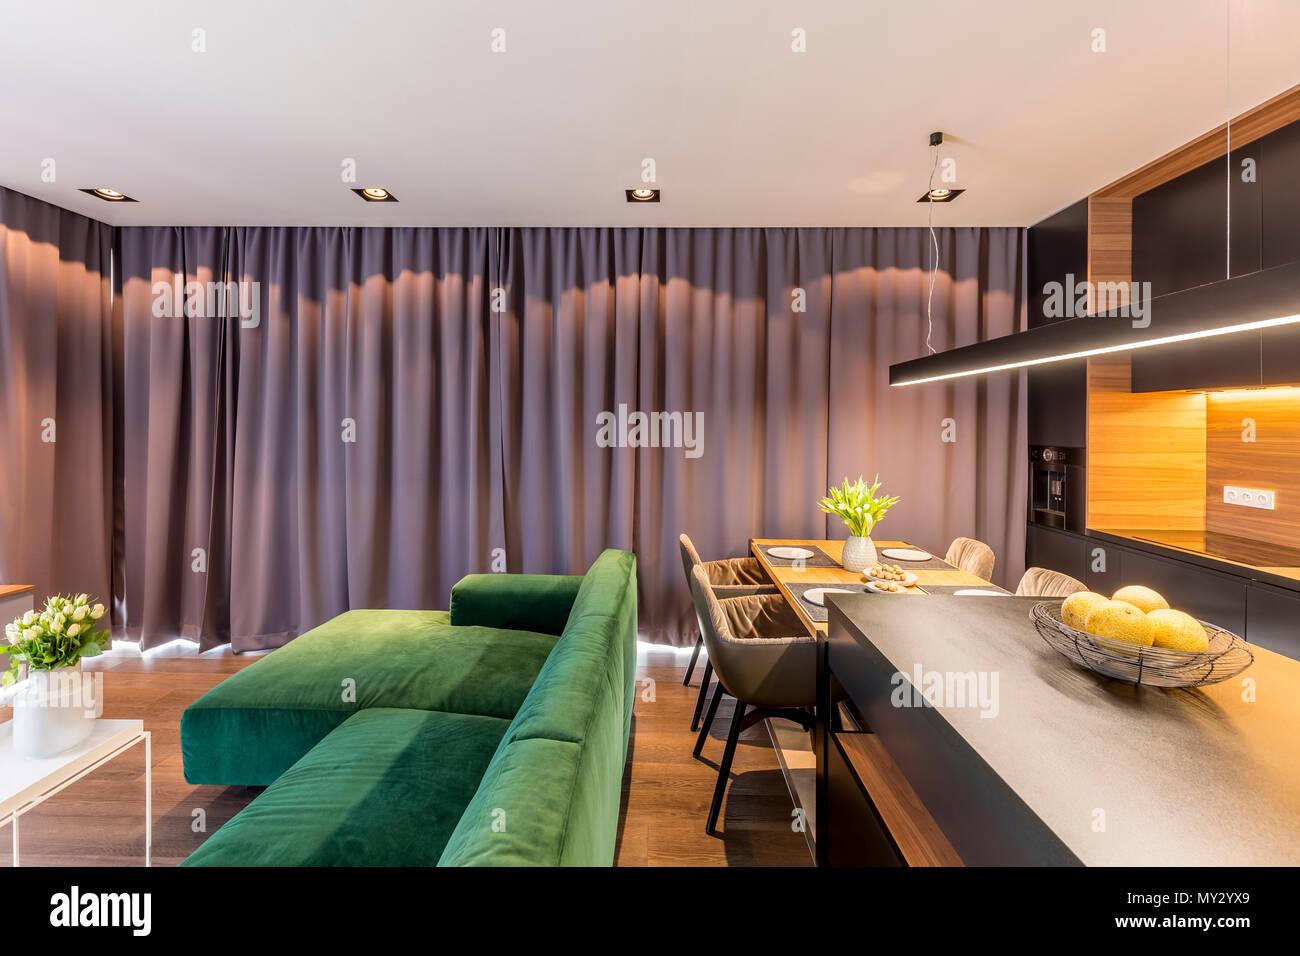 Green corner sofa in grey apartment interior with kitchen island